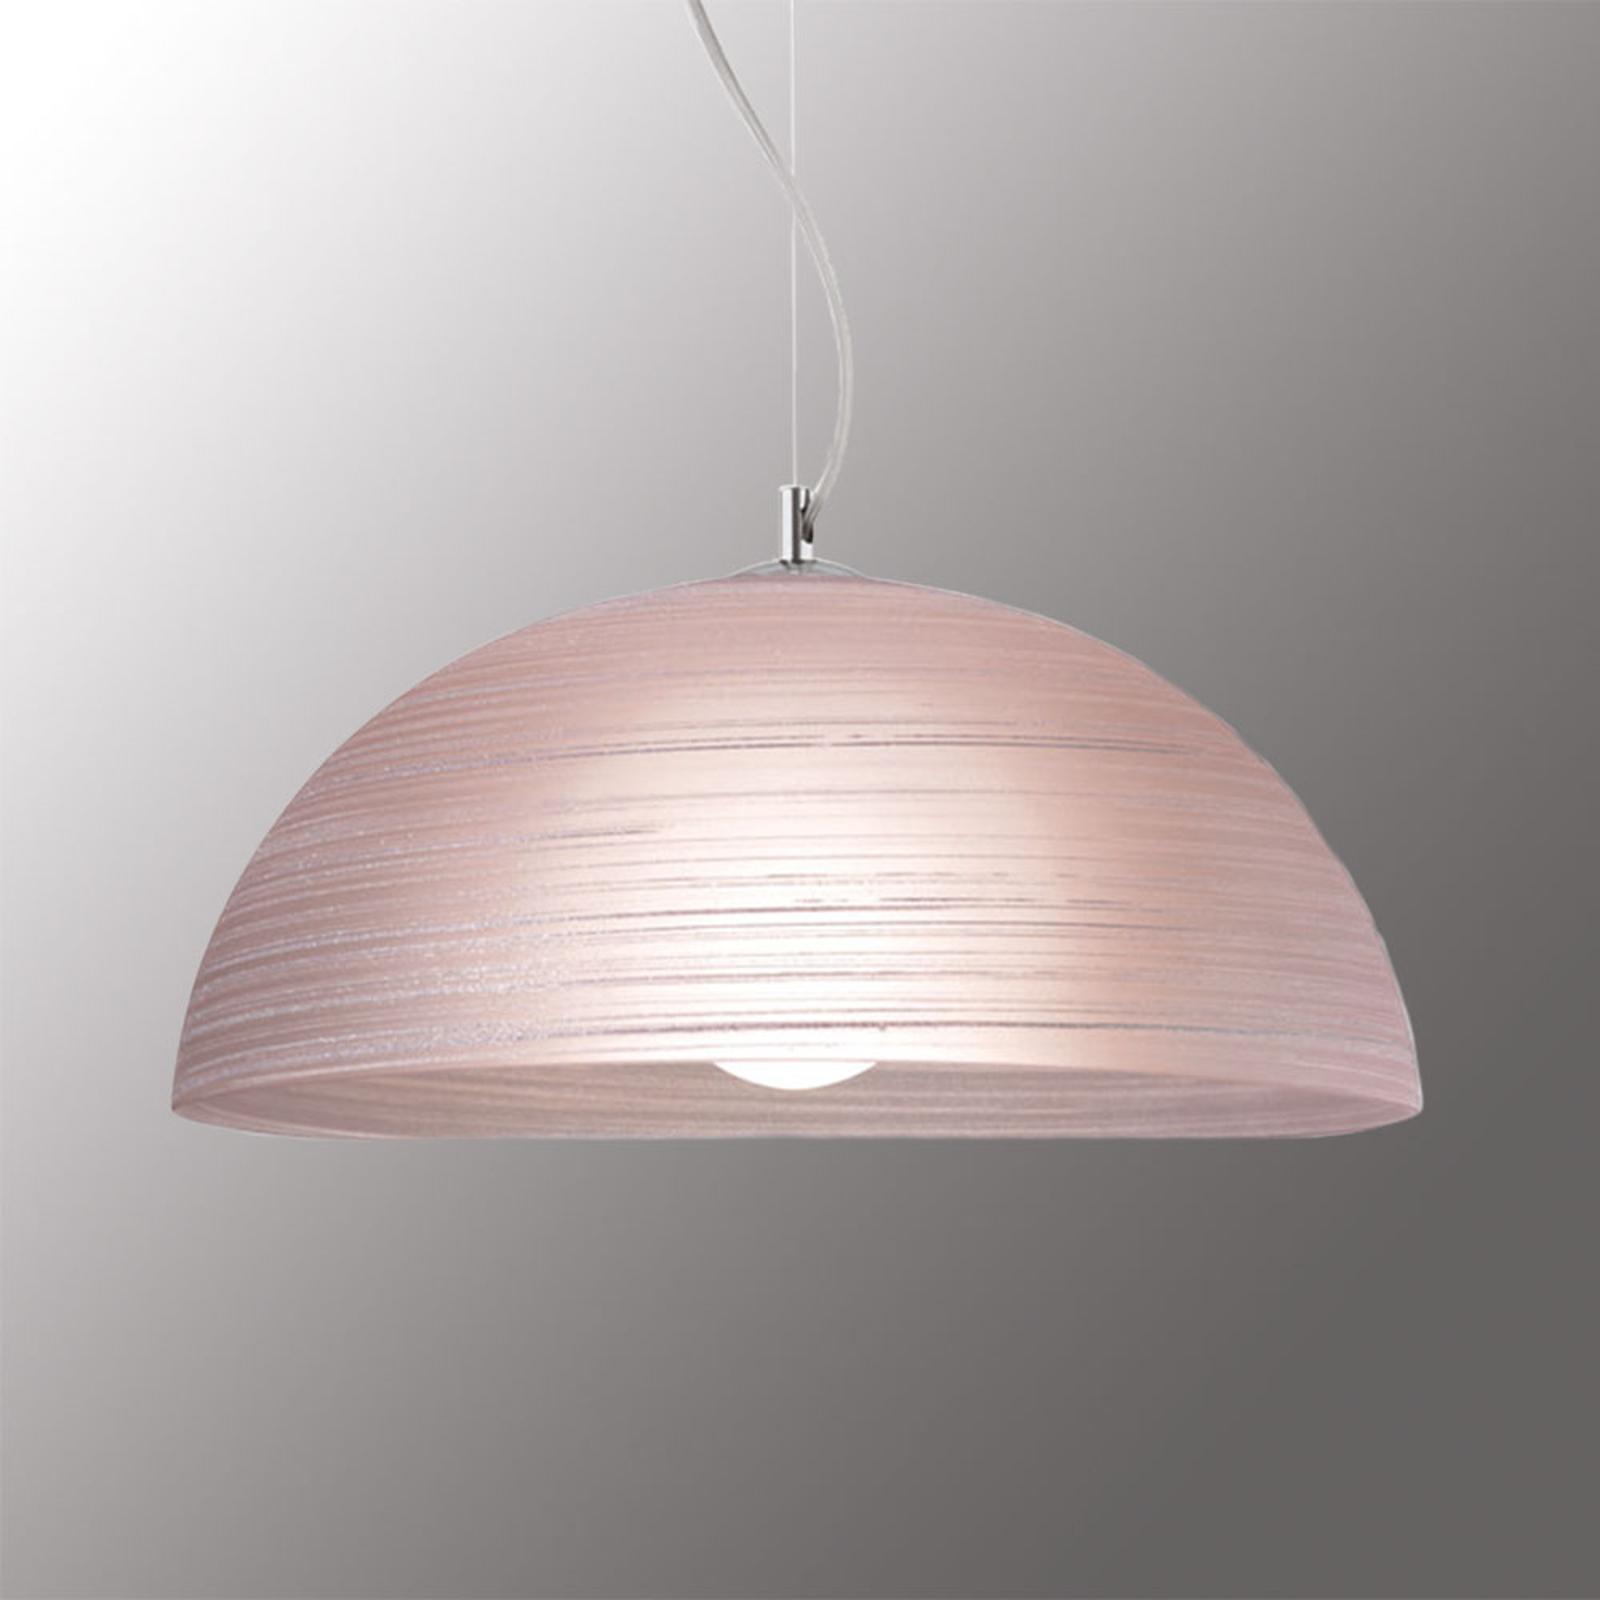 Handgedecoreerde hanglamp Modesto, oud roze